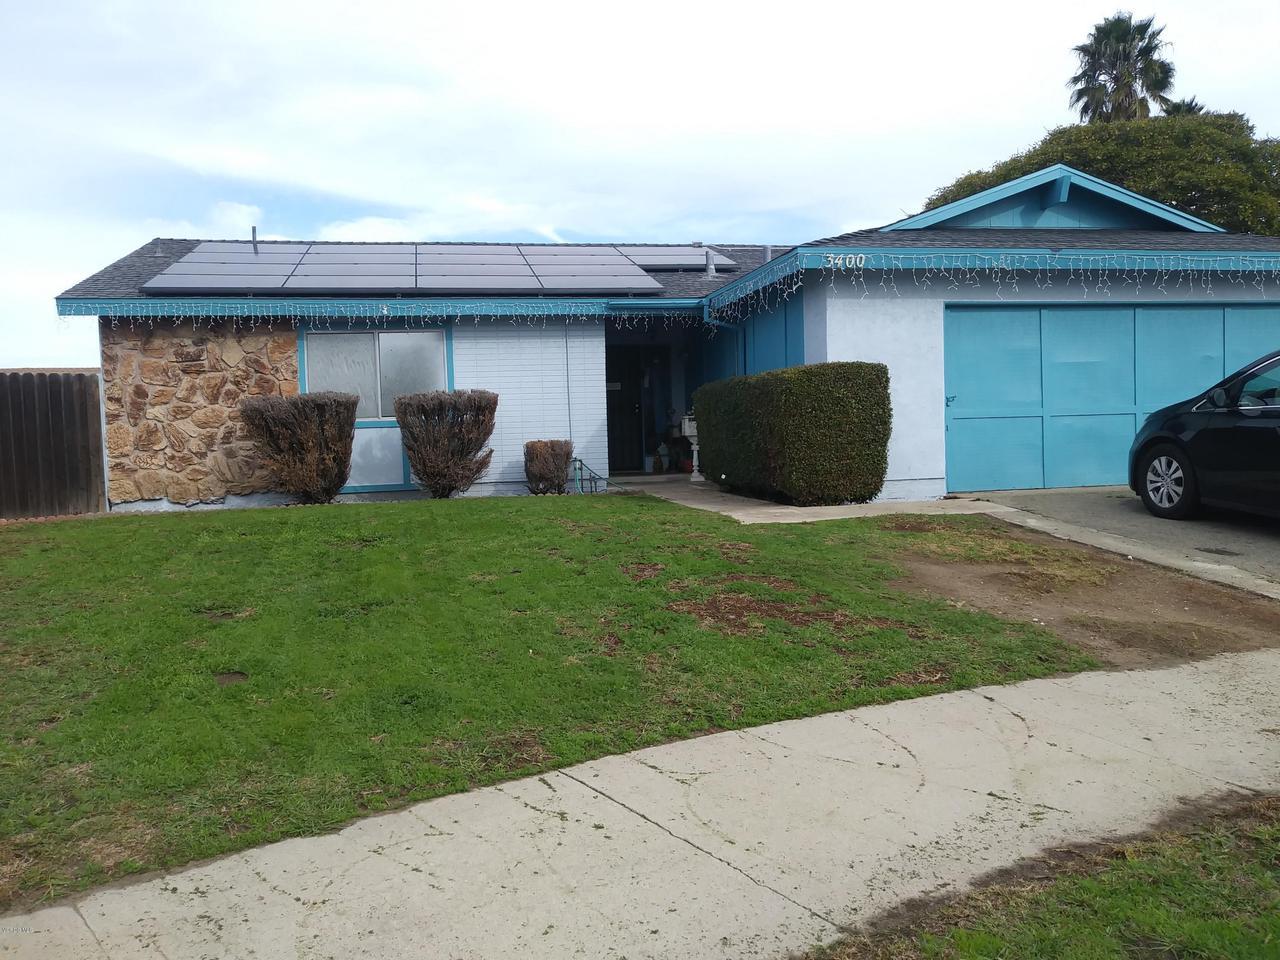 3400 FRANKFORT, Oxnard, CA 93033 - Front Yard